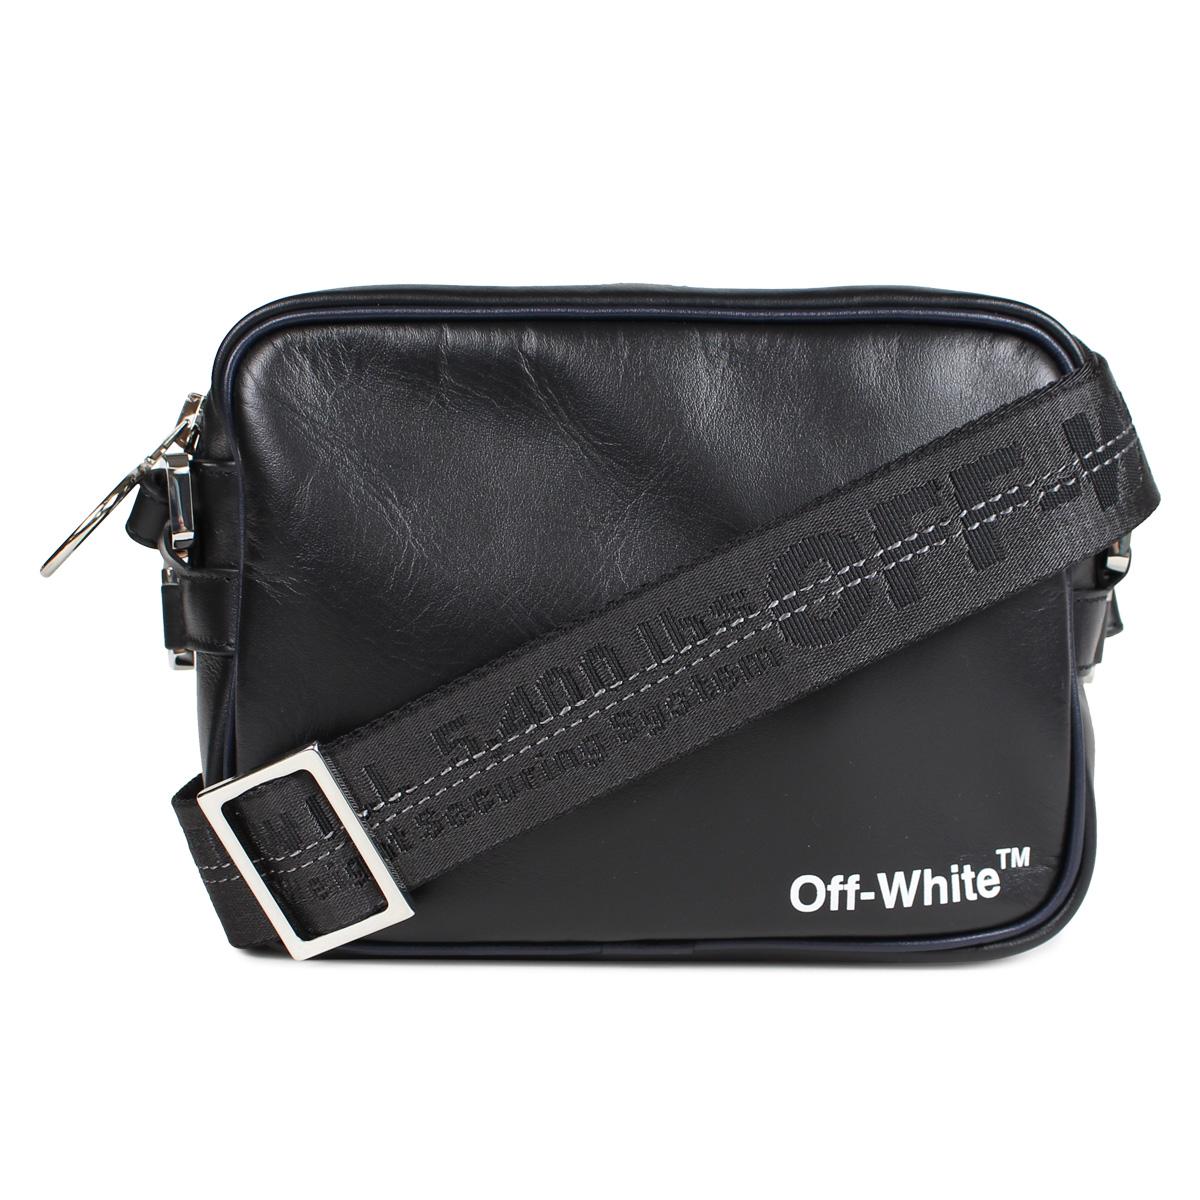 53750c89911a ALLSPORTS  Off-white CROSSBODY BAG off-white bag shoulder bag men gap Dis  black OMNA049 1001  2 22 Shinnyu load   192